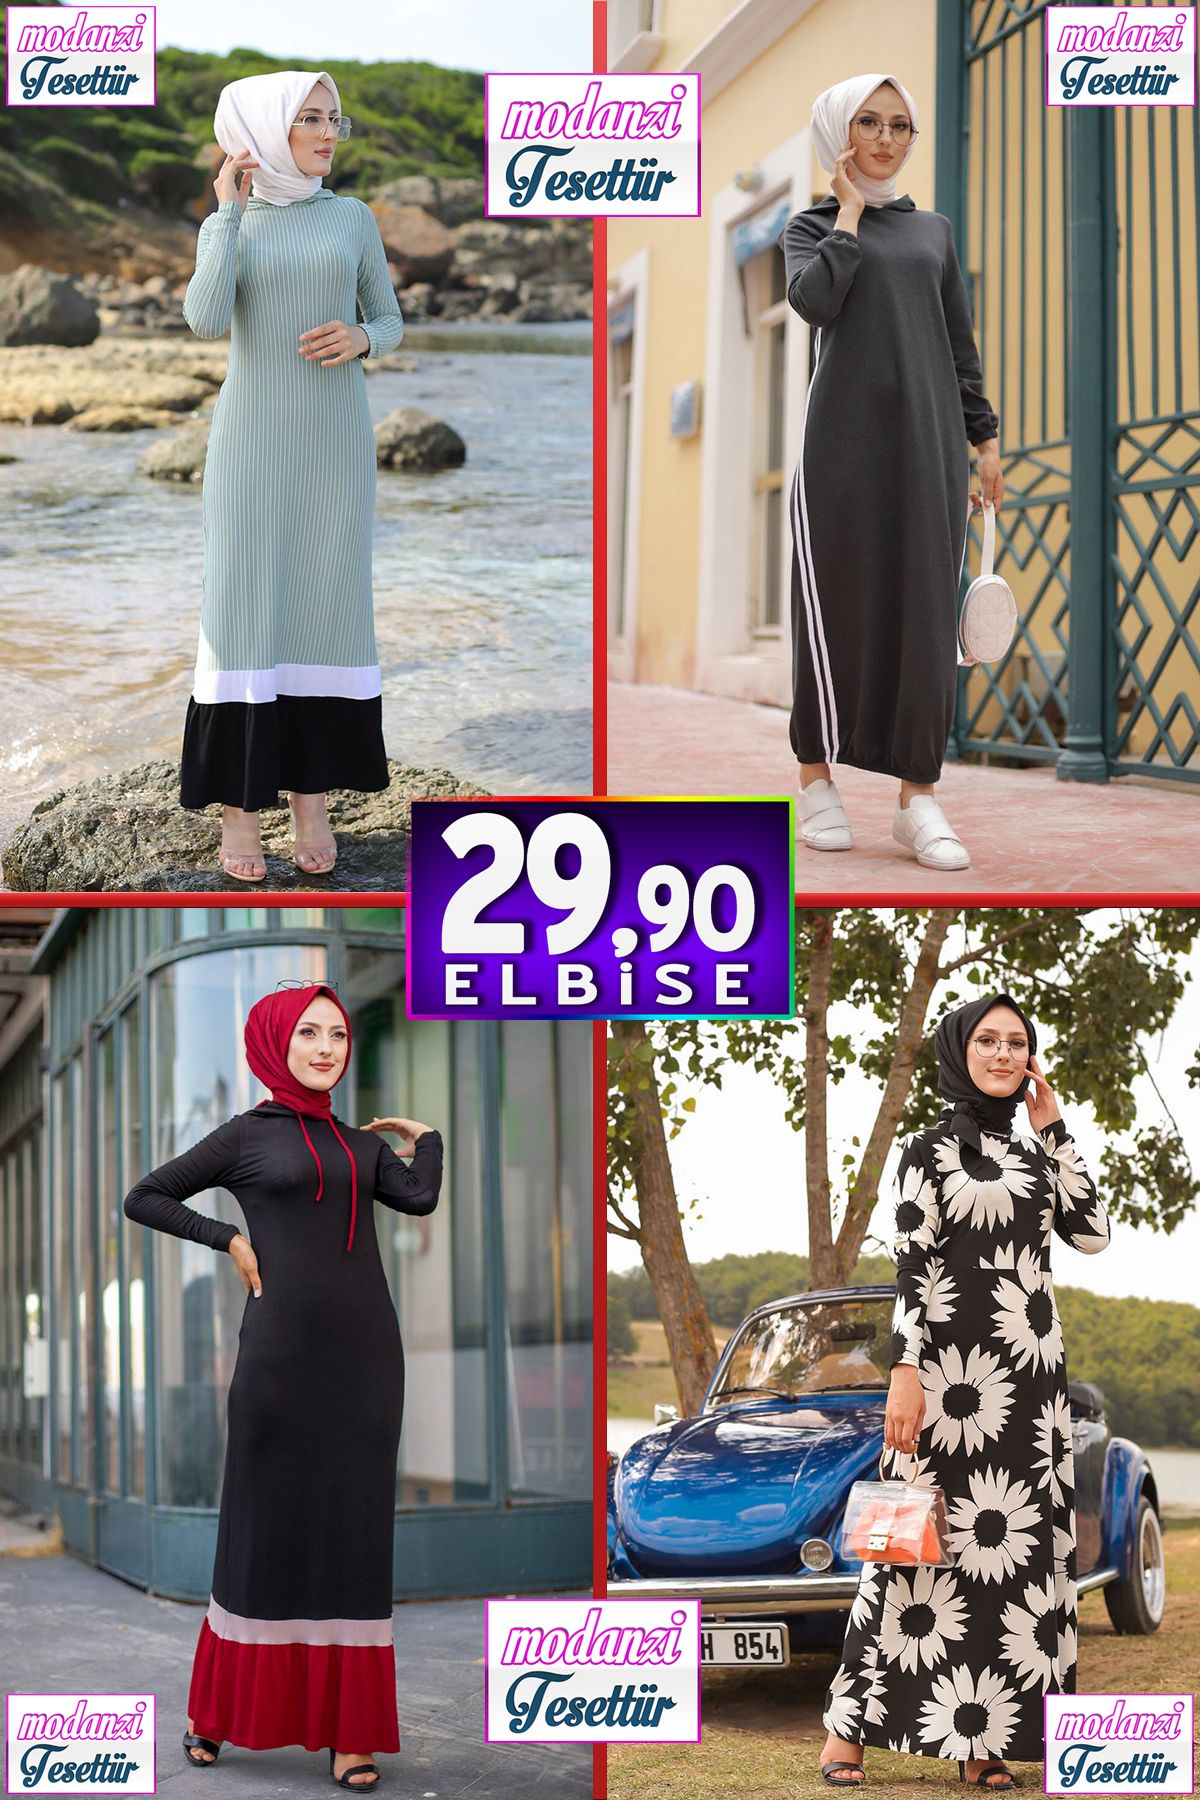 Tofisa 29 90 Tl Elbise Modelleri 1 Kampanya Indirim Ucuz Tesettur Elbise Modelleri 2020 Elbise Elbise Modelleri Moda